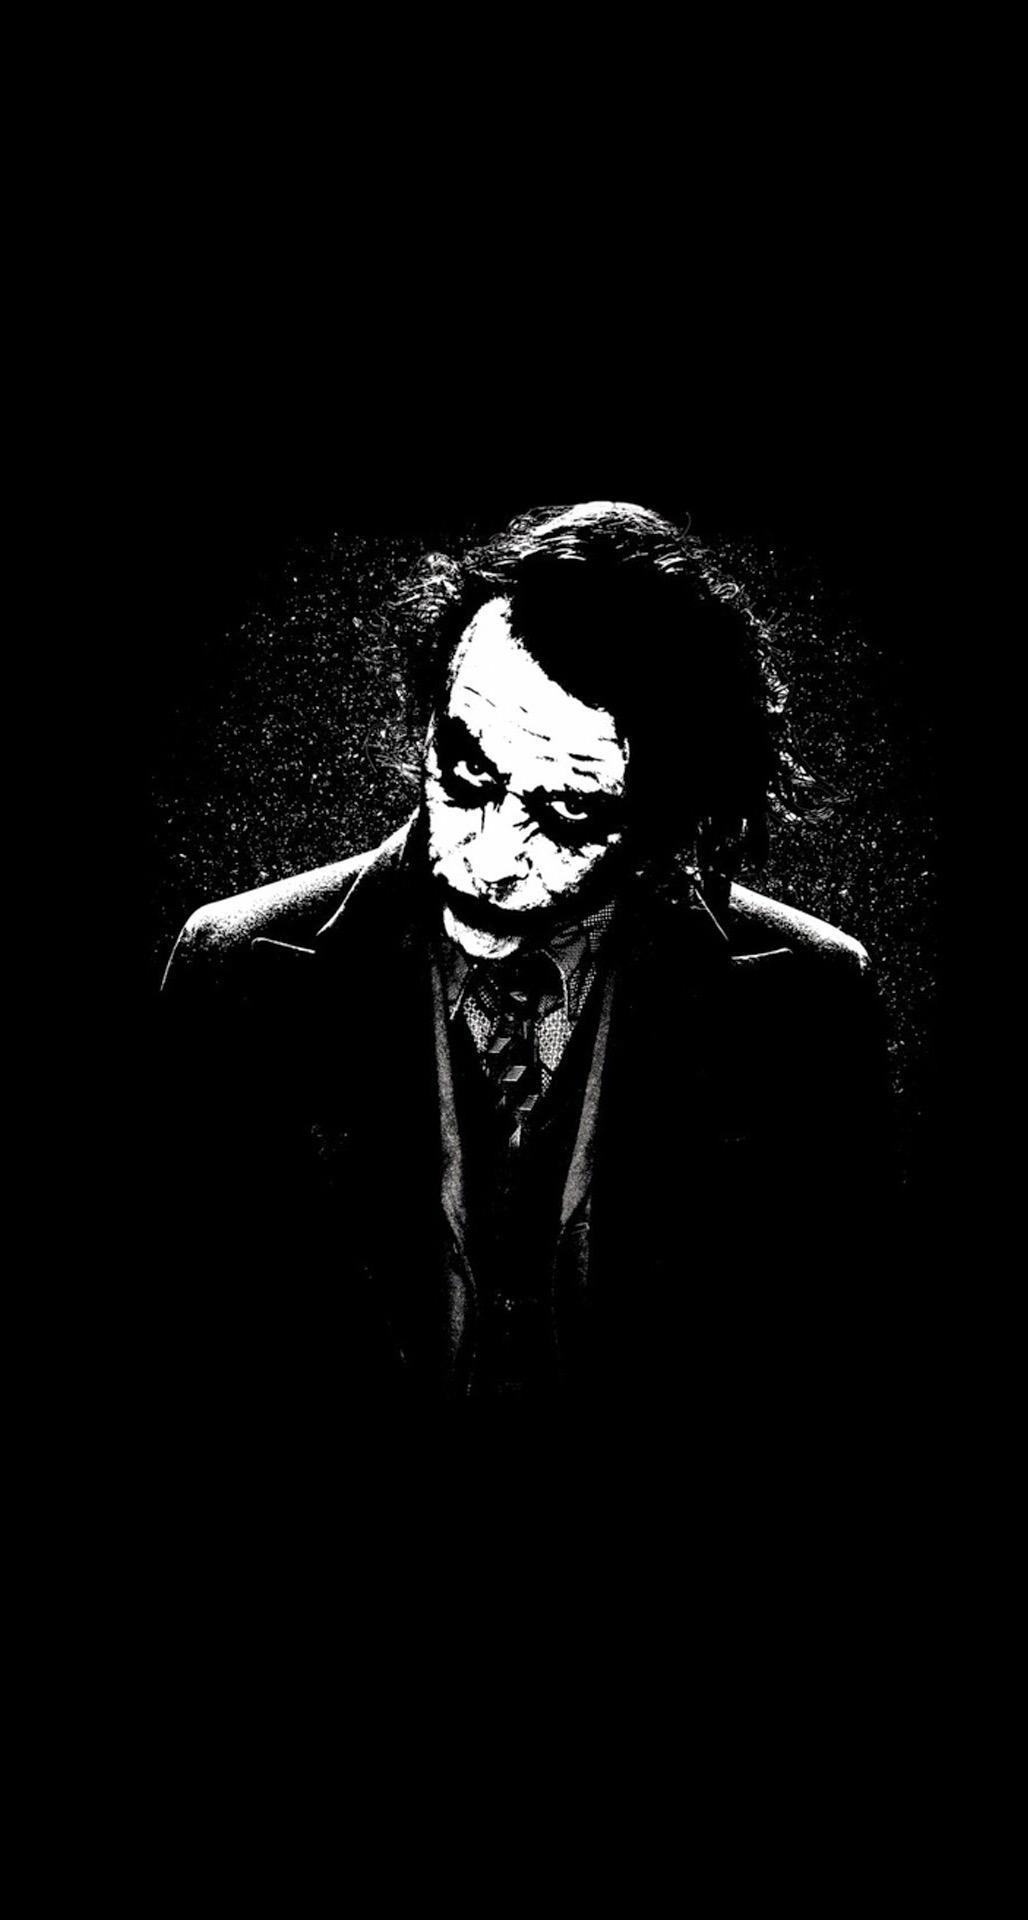 X Joker Heath Ledger Illustration Iphone Iphone S